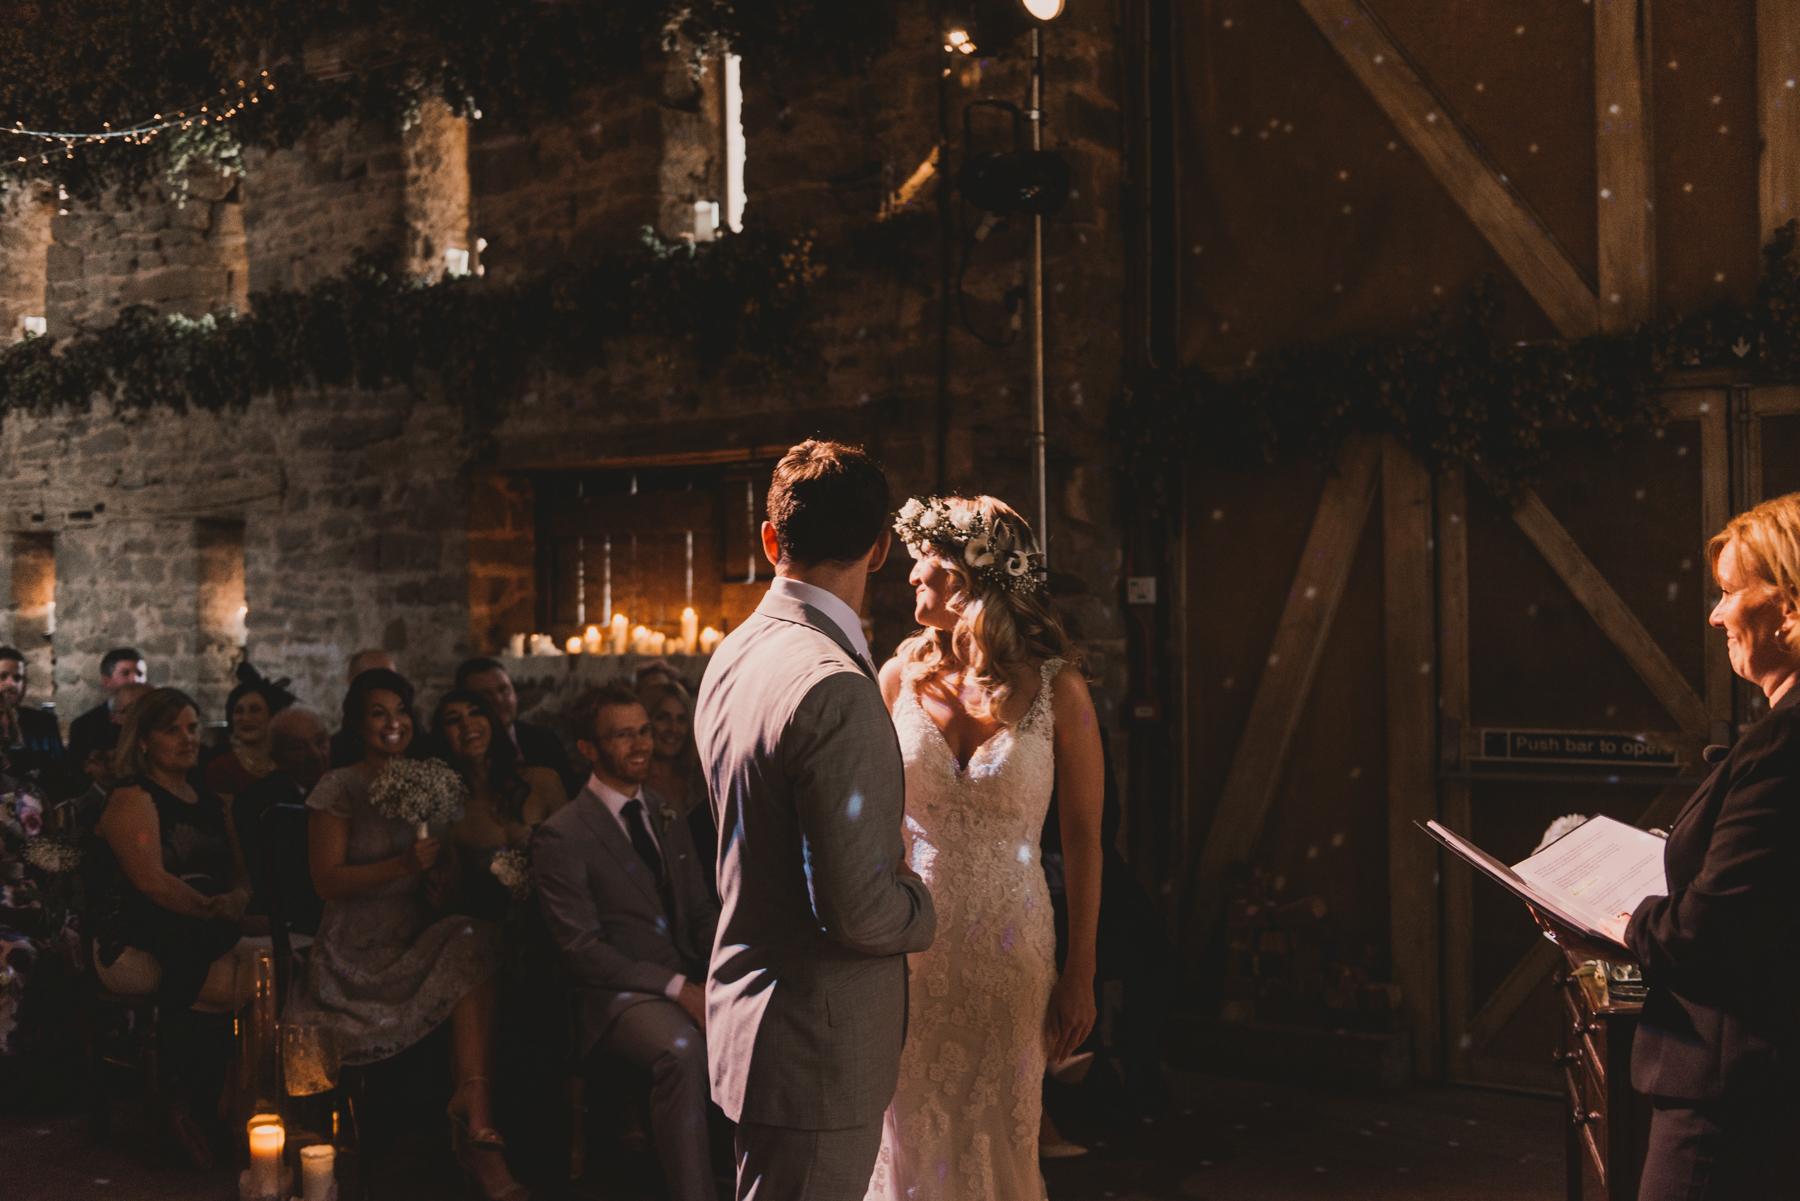 Herefordshire-barn-wedding-highlights-042.jpg